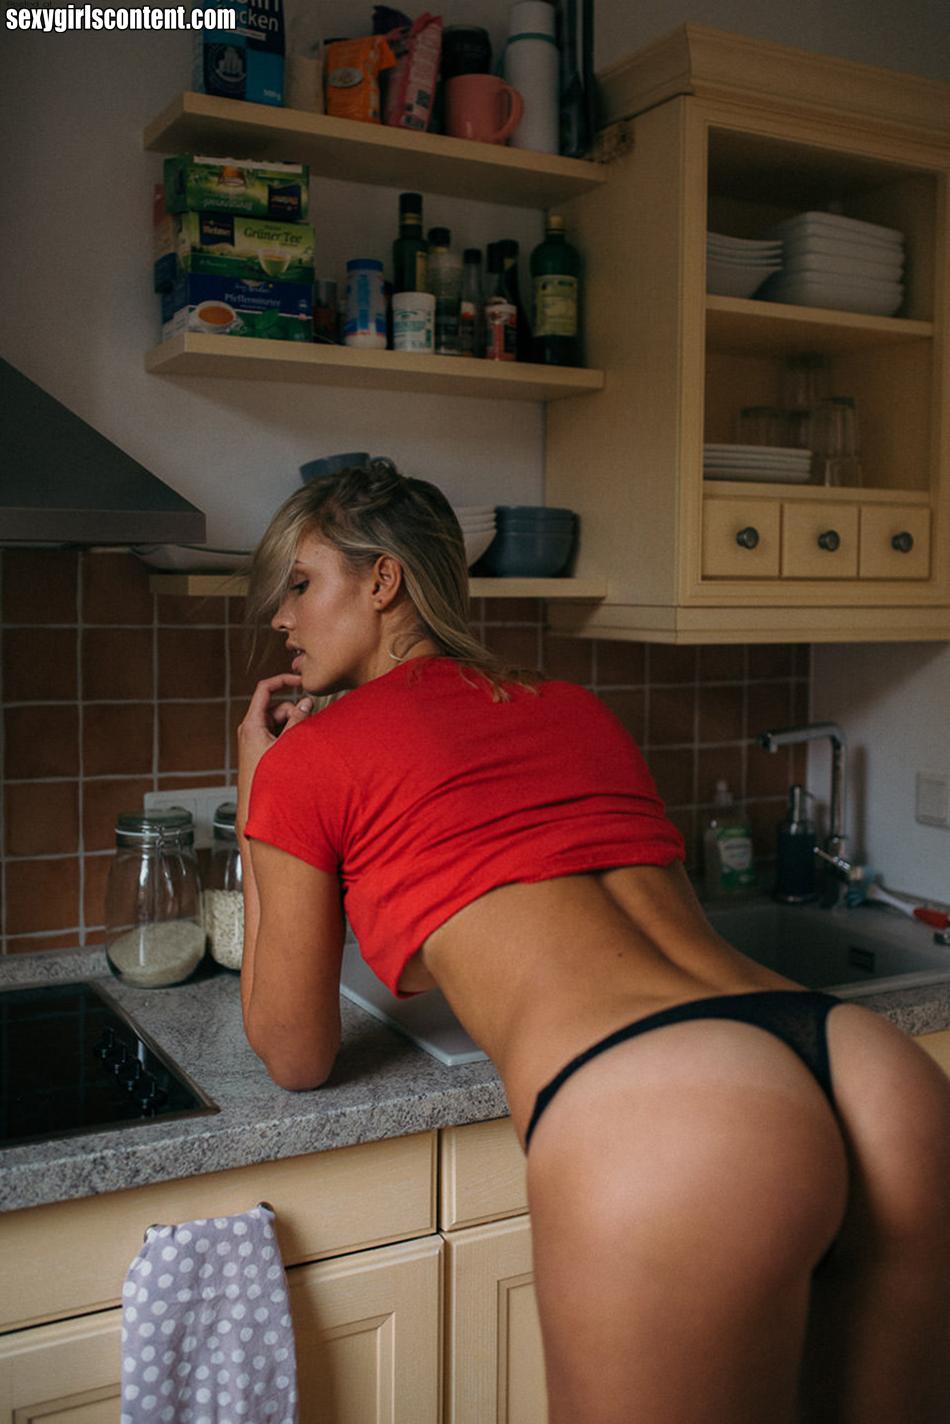 Nude sex photos stripted